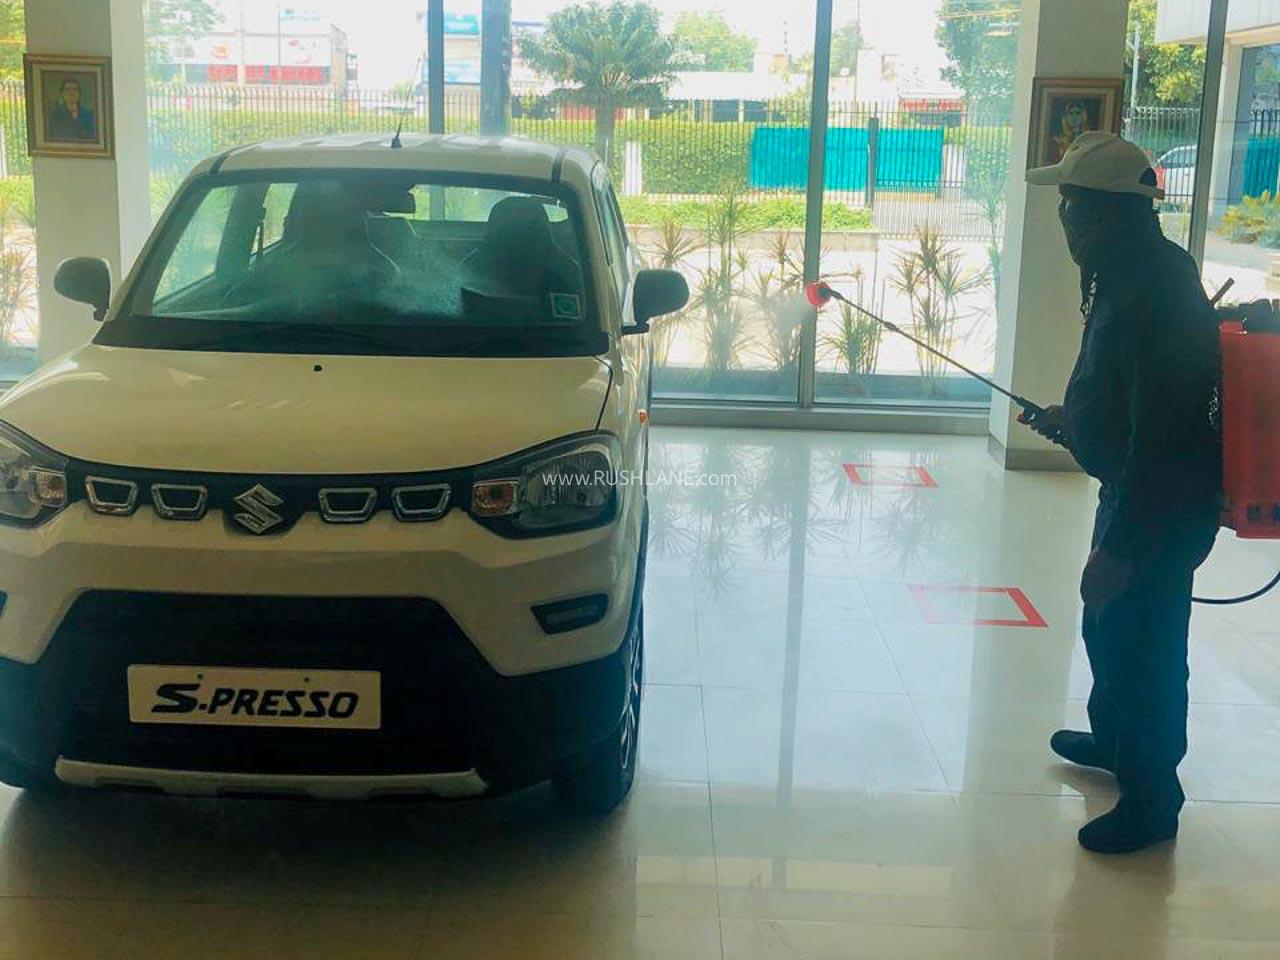 Maruti cars getting sanitized